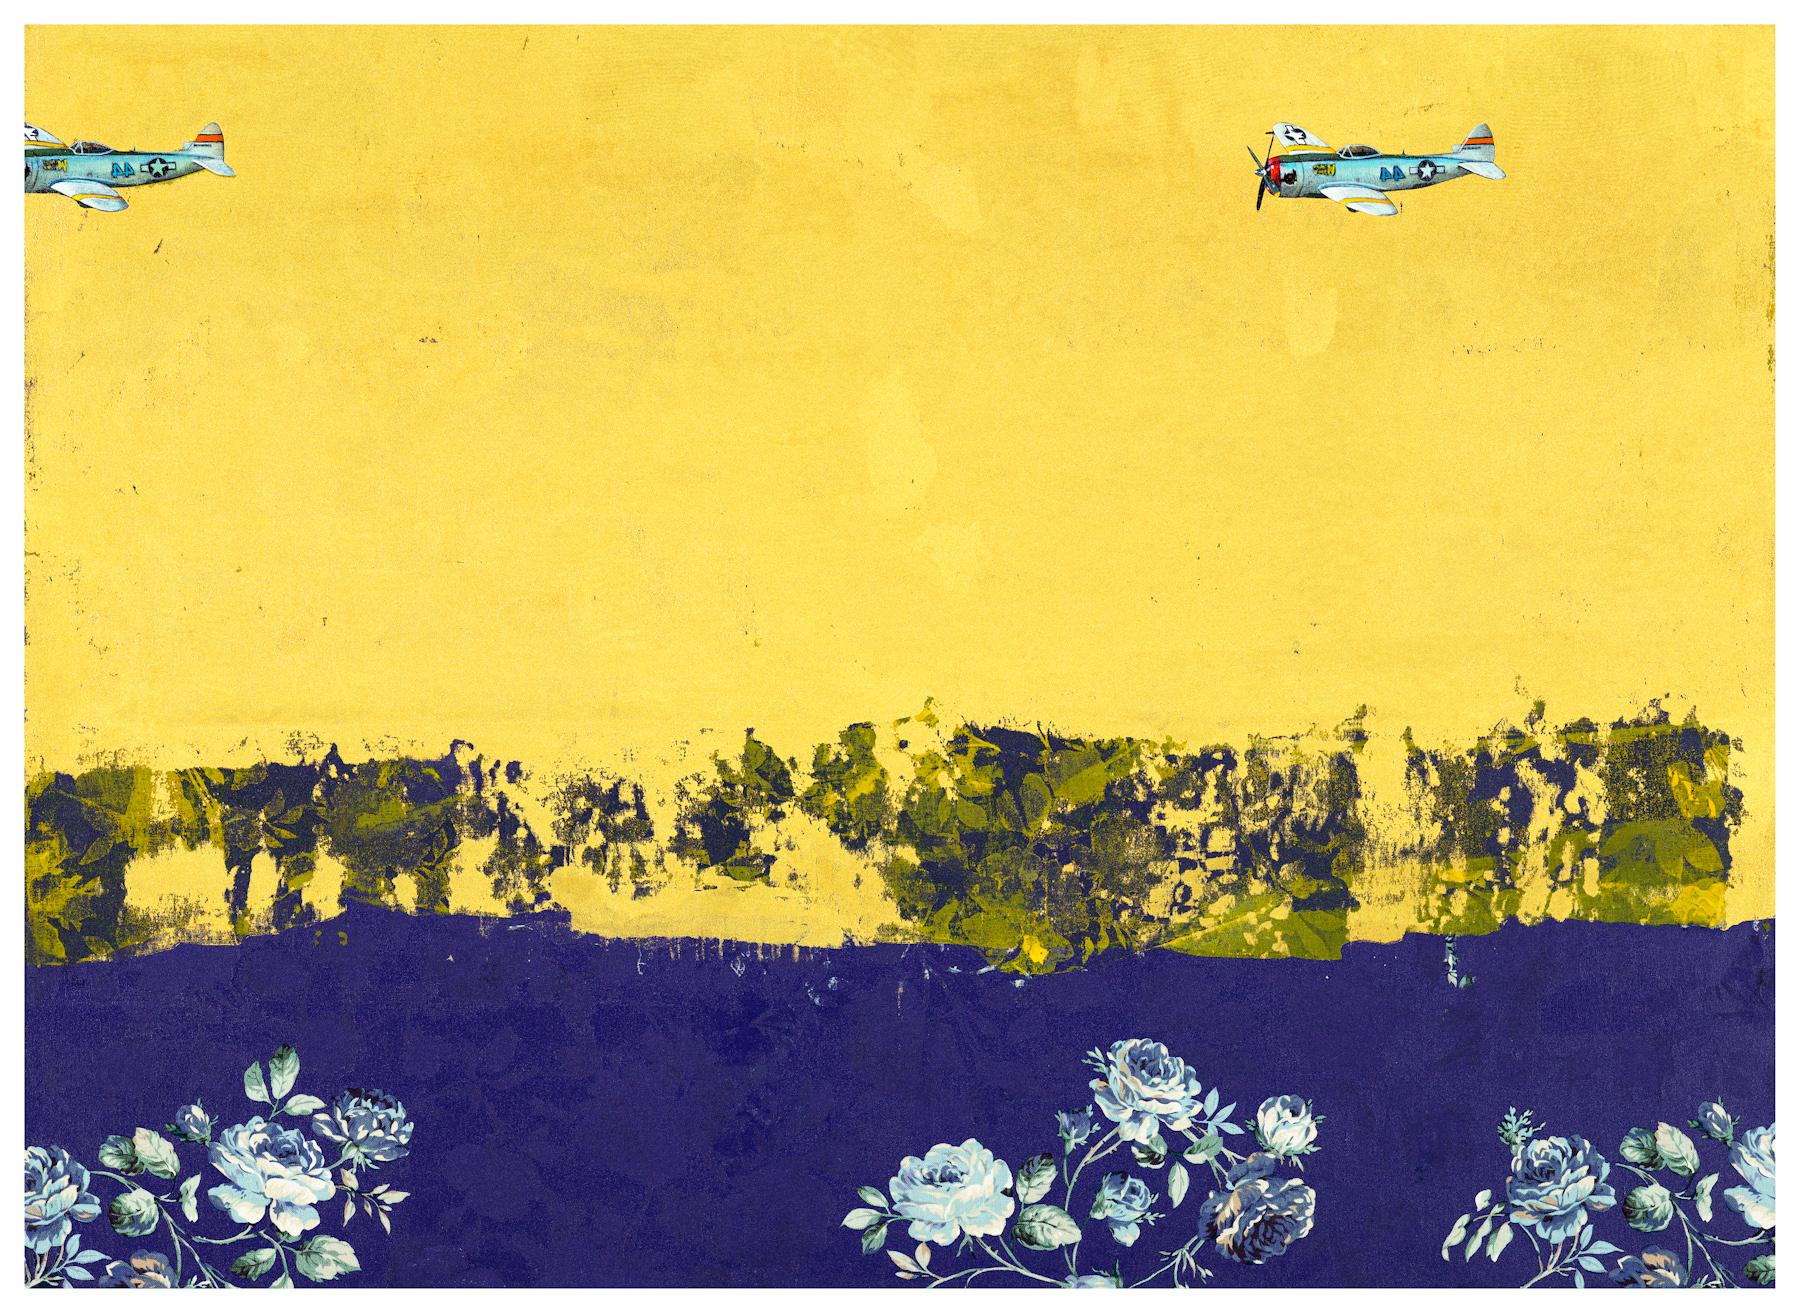 CHI Chien, Indigo River, 2014, Mixed Media, 73 x 100 cm, Affinity for ART.jpg